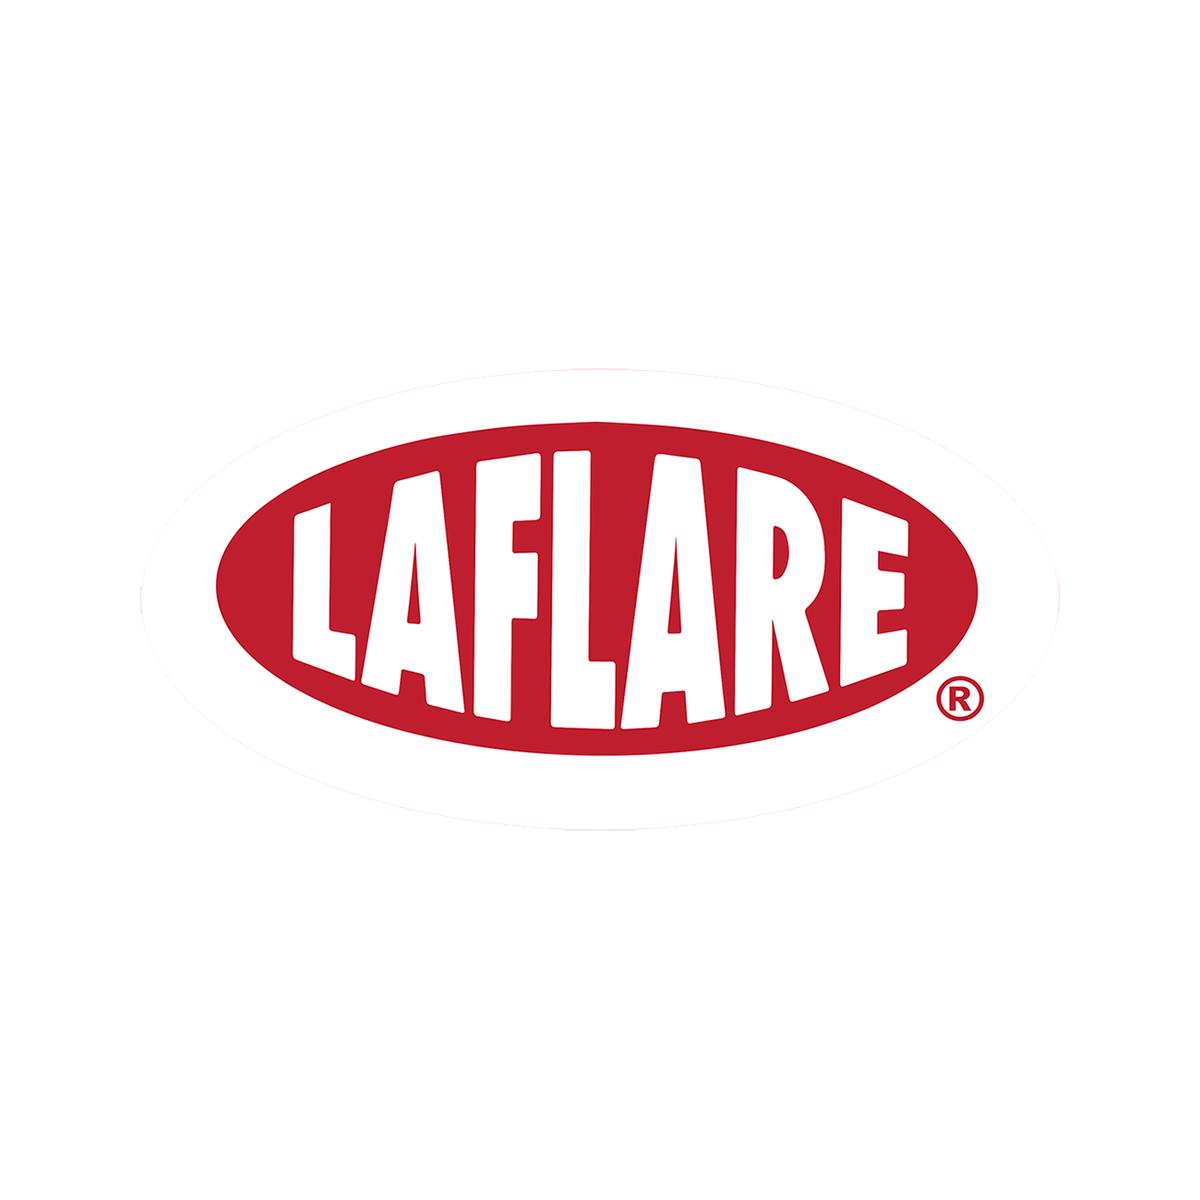 "LaFlare Oval Sticker - 7"" x 3.5"" + Album Bundle"